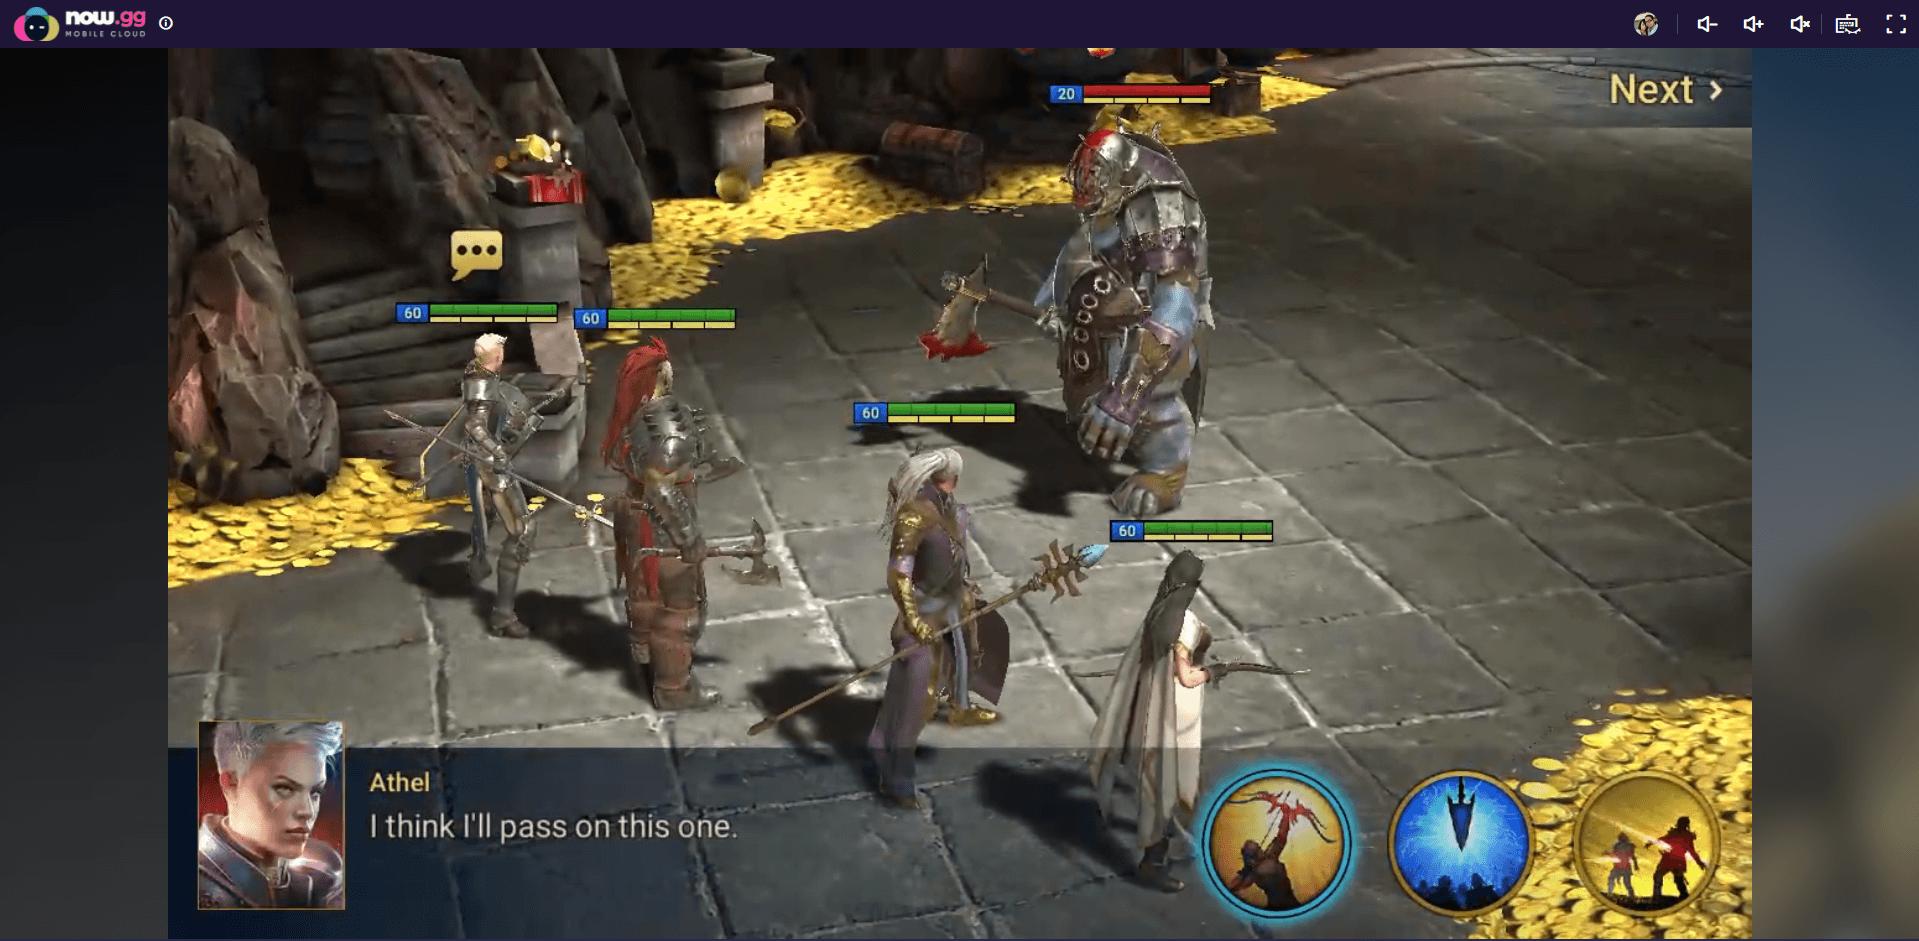 BlueStacks X ile Buluttan RAID: Shadow Legends Nasıl Oynanır?